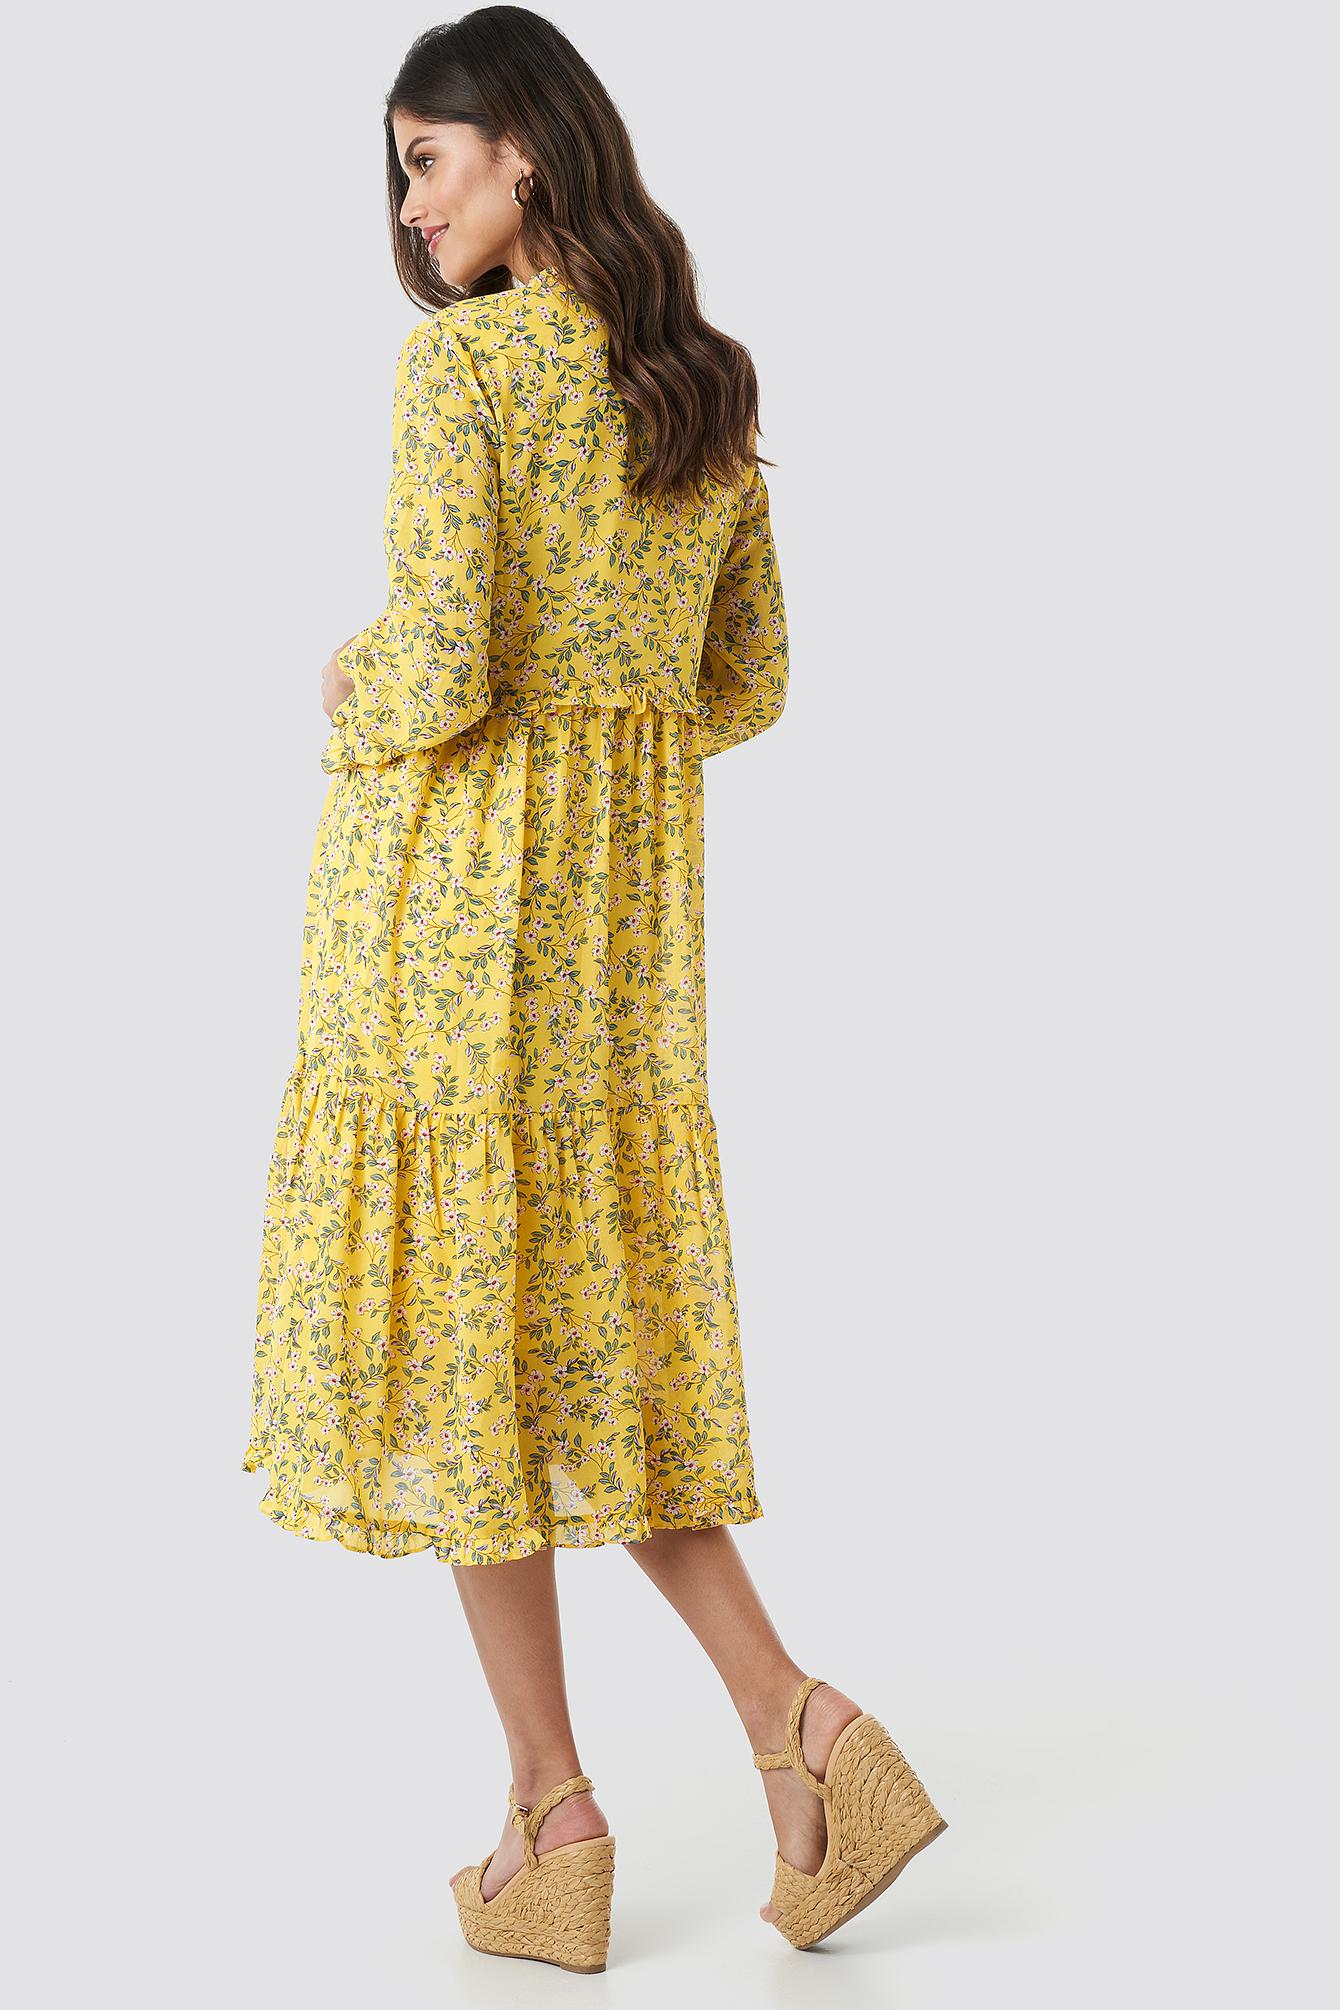 V-Neck Flower Print Chiffon Dress NA-KD.COM